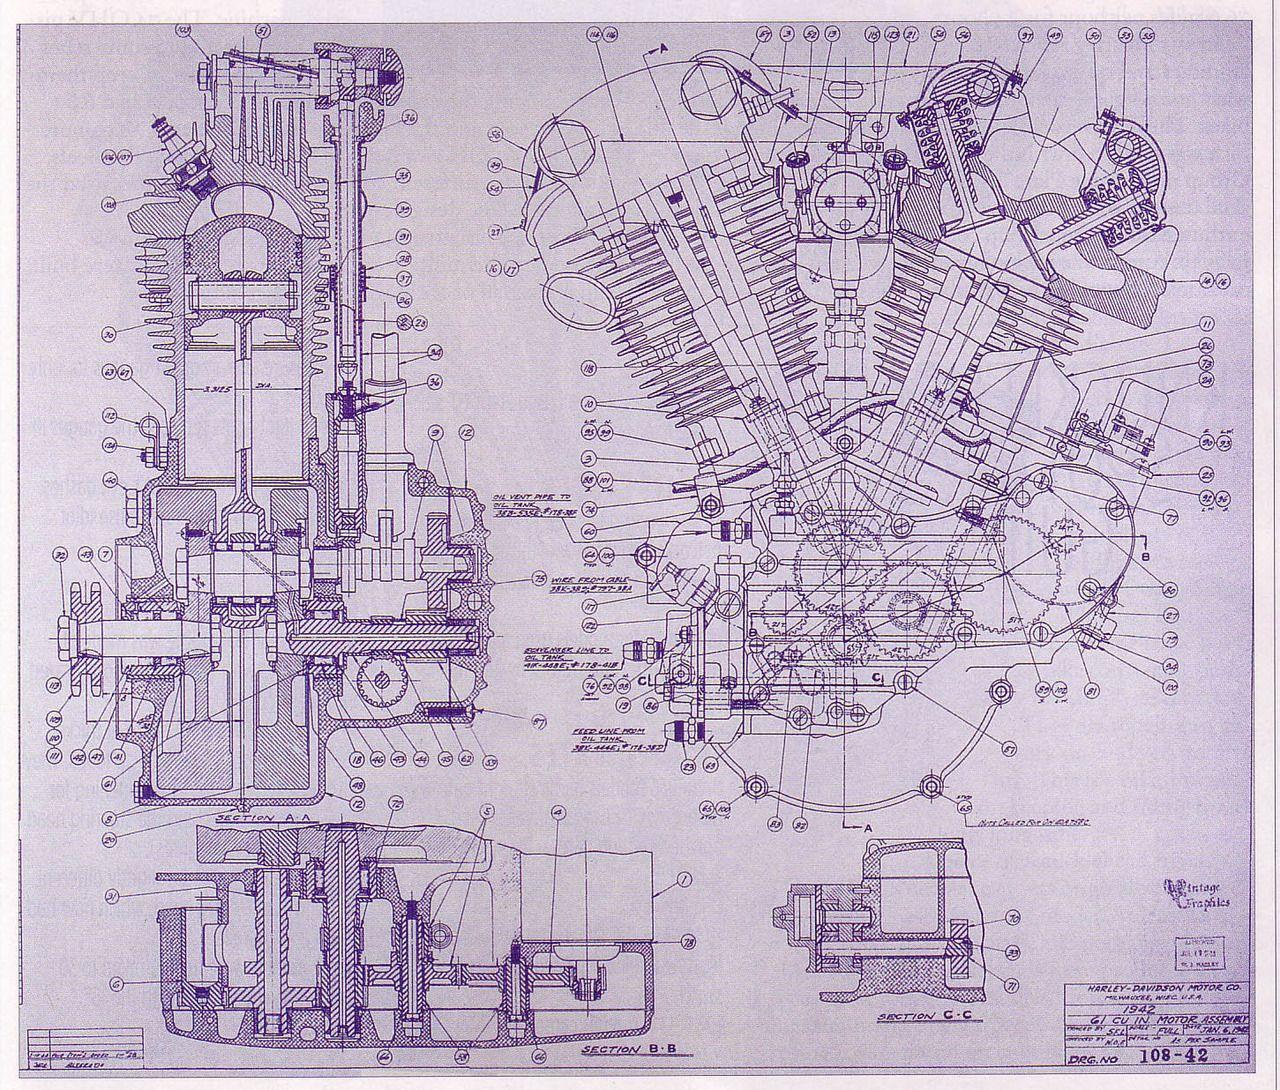 harley davidson motor assembly white motorcycle motorcycle racers motorcycle engine v engine  [ 1280 x 1090 Pixel ]